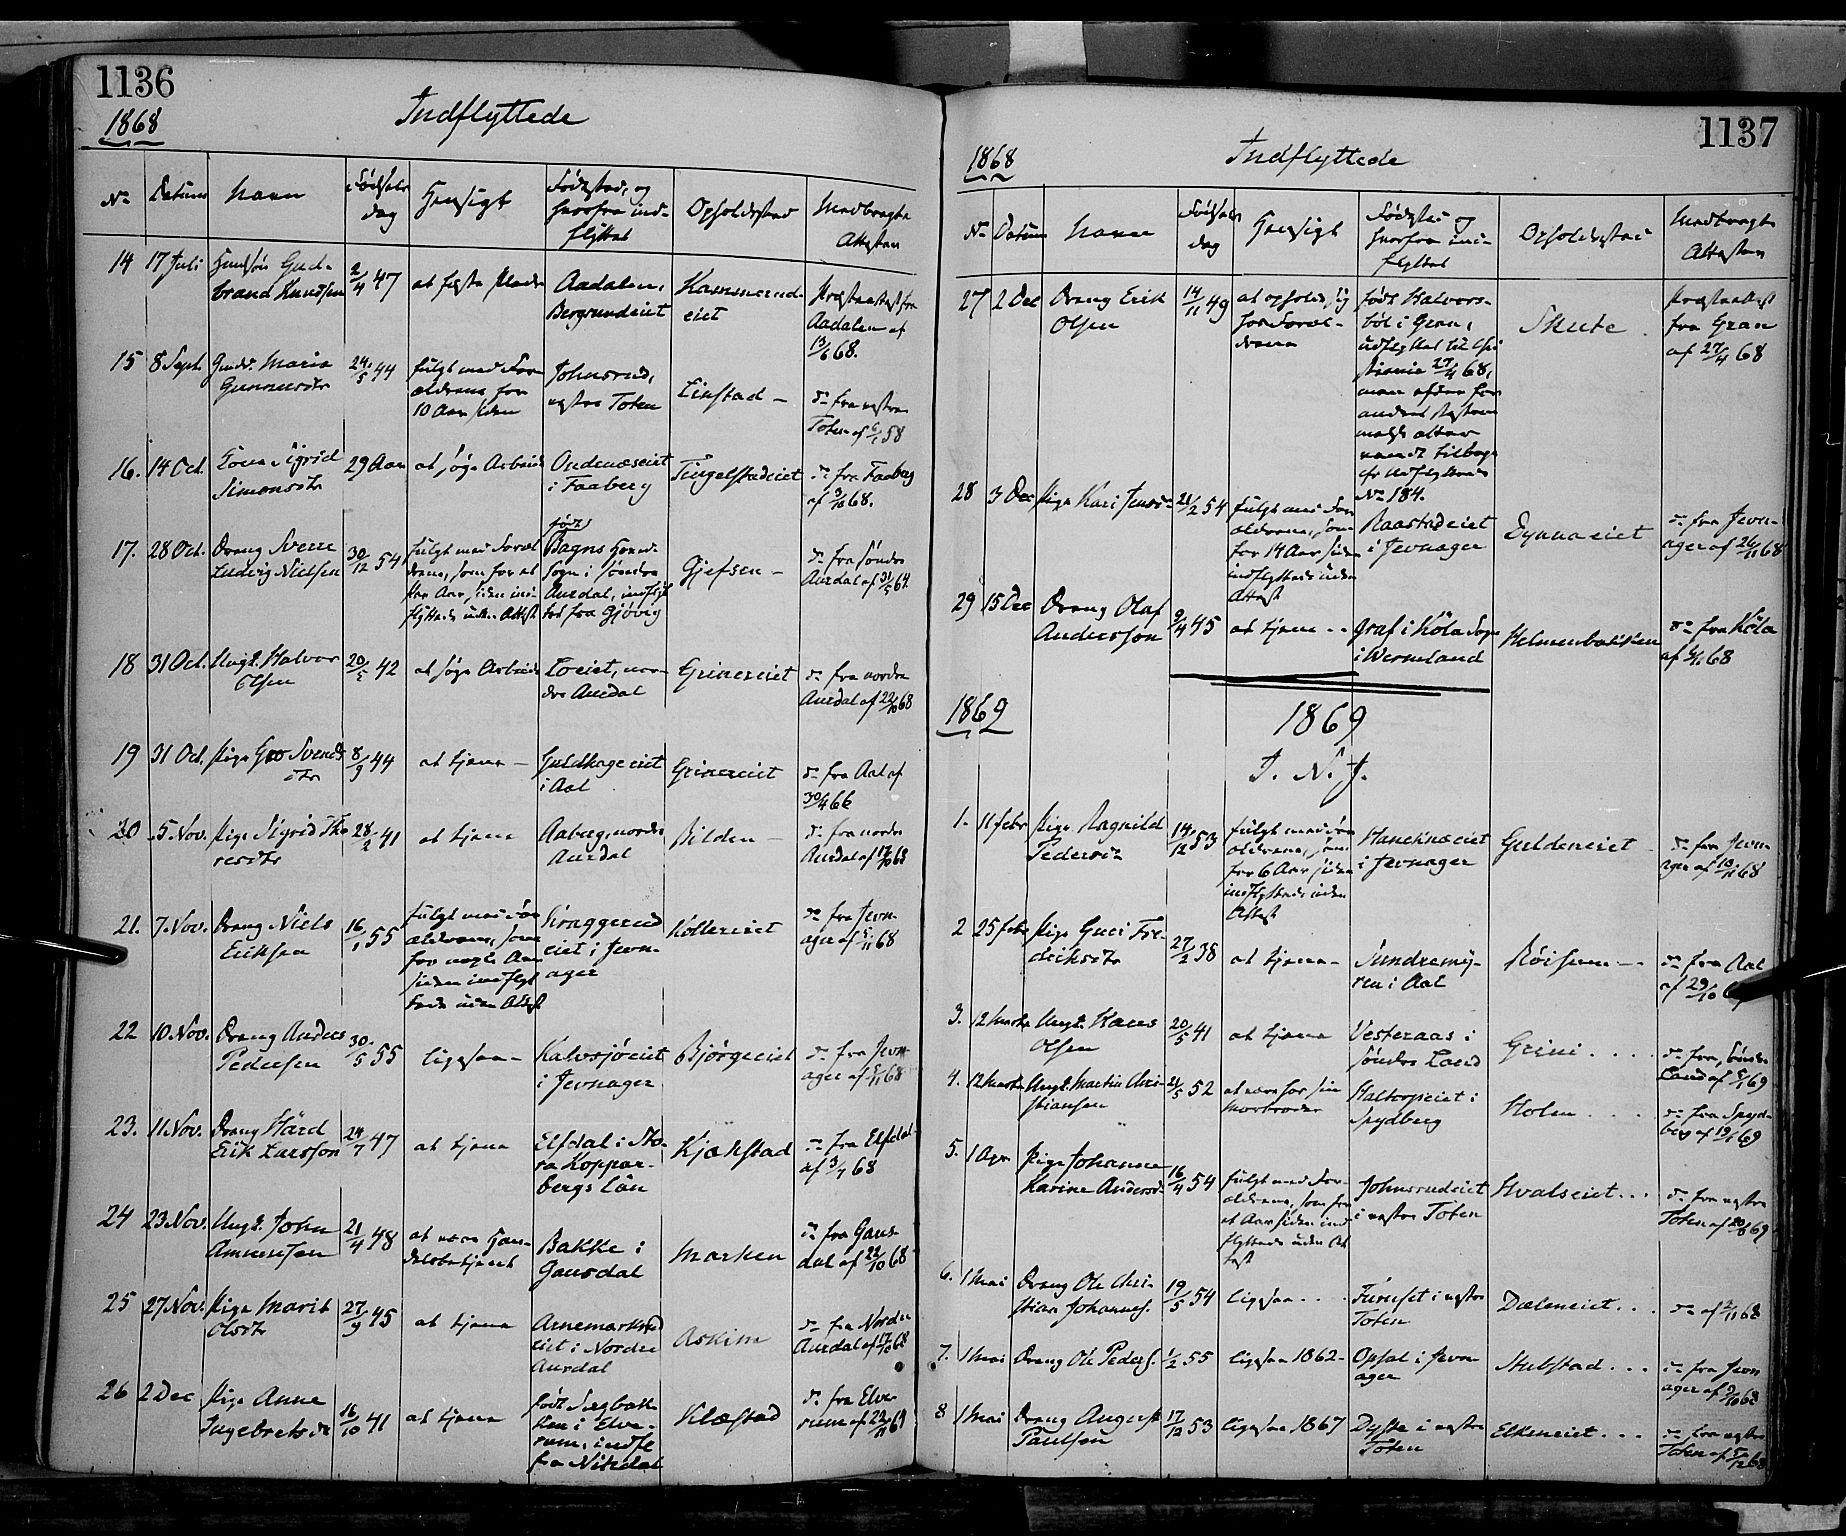 SAH, Gran prestekontor, Ministerialbok nr. 12, 1856-1874, s. 1136-1137